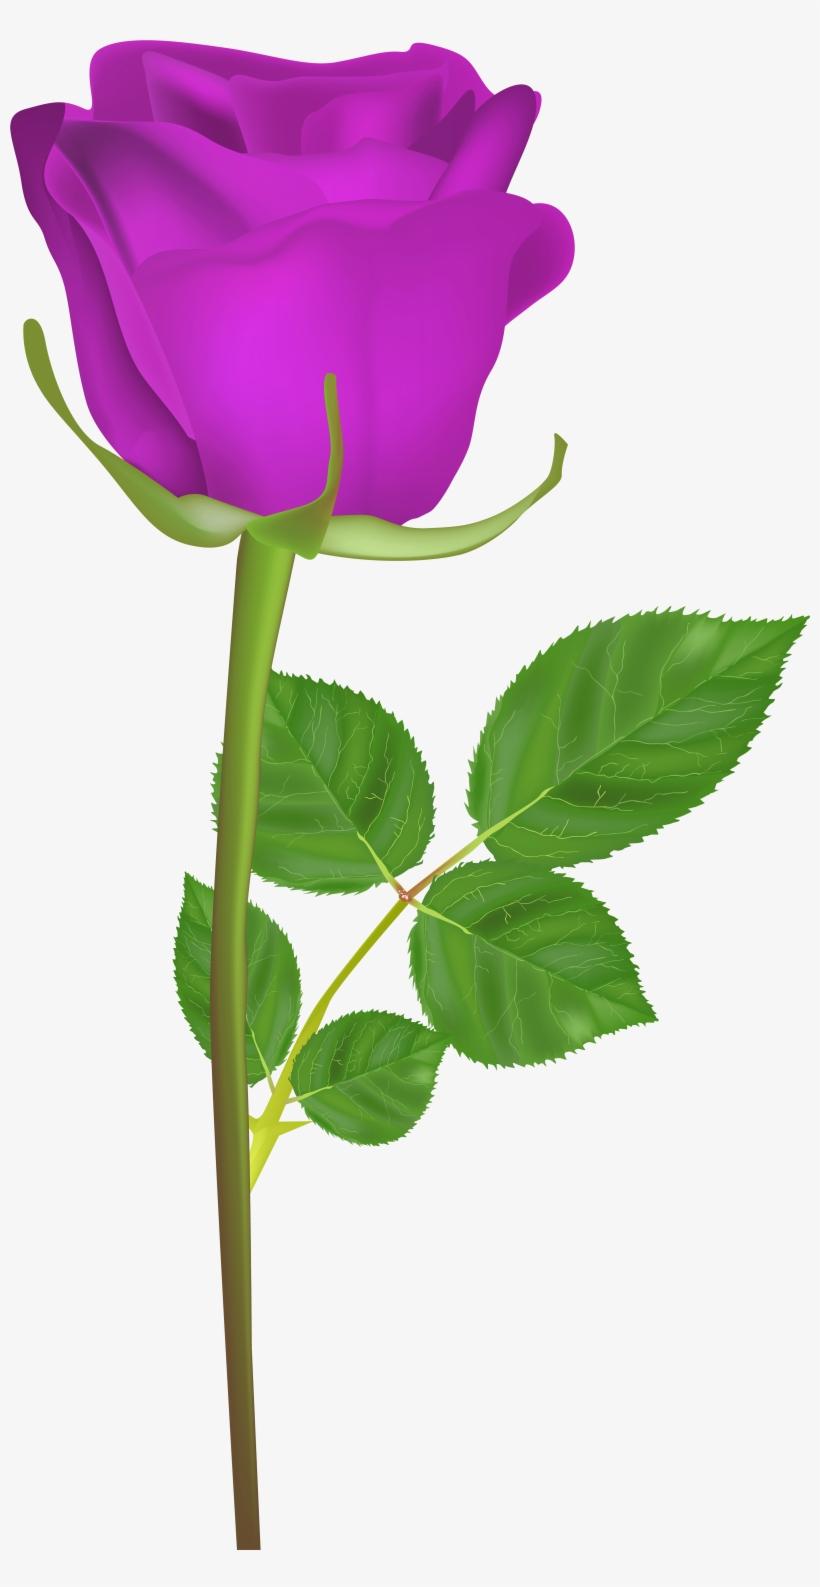 Rose With Stem Purple Png Clip Art Imageu200b Gallery Good Morning